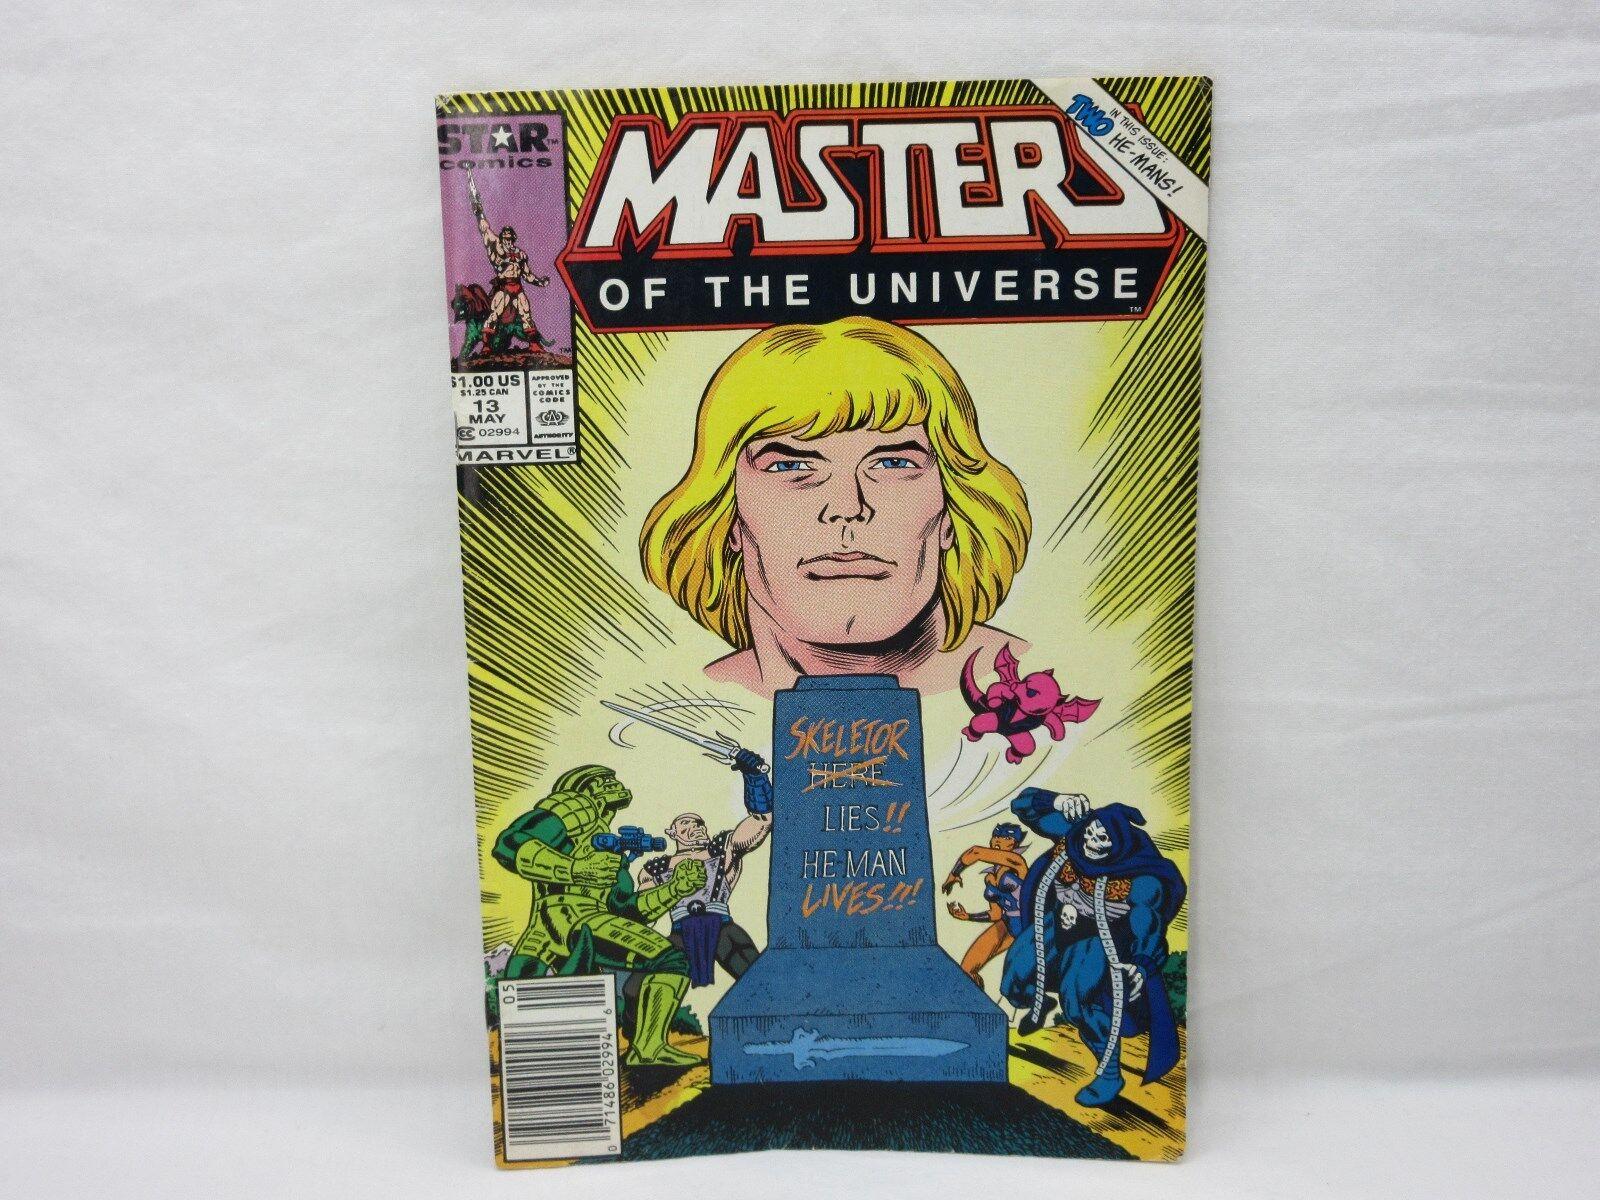 MOTU,SKELETOR LIES HE-MAN LIVES,STAR full Dimensione comic,Masters of the Universe